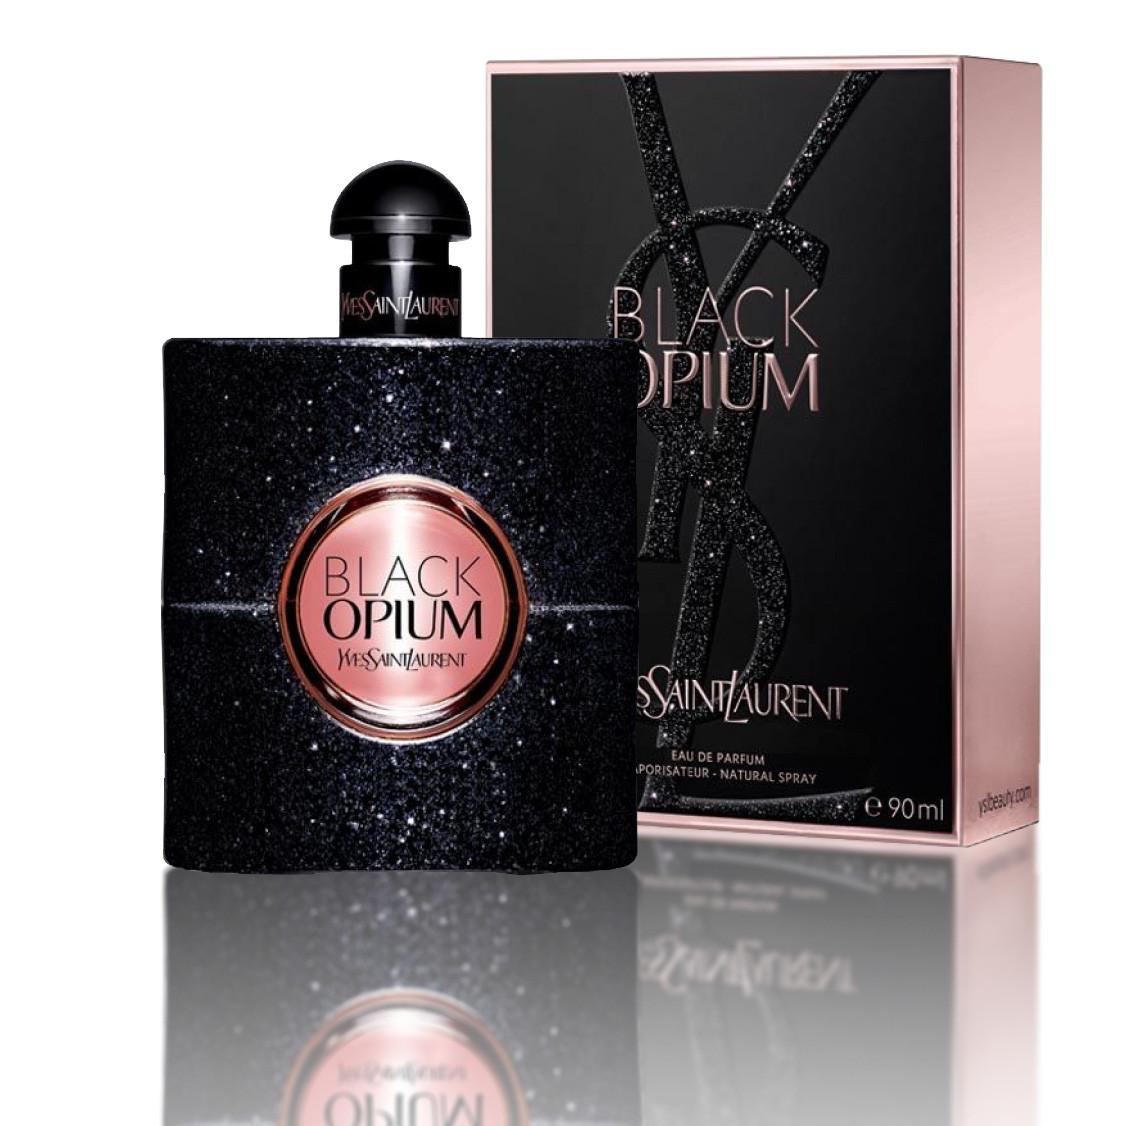 Оригінальна жіноча Парфумована вода Yves Saint Laurent Black Opium( Ів Сен Лоран Блек опіум)